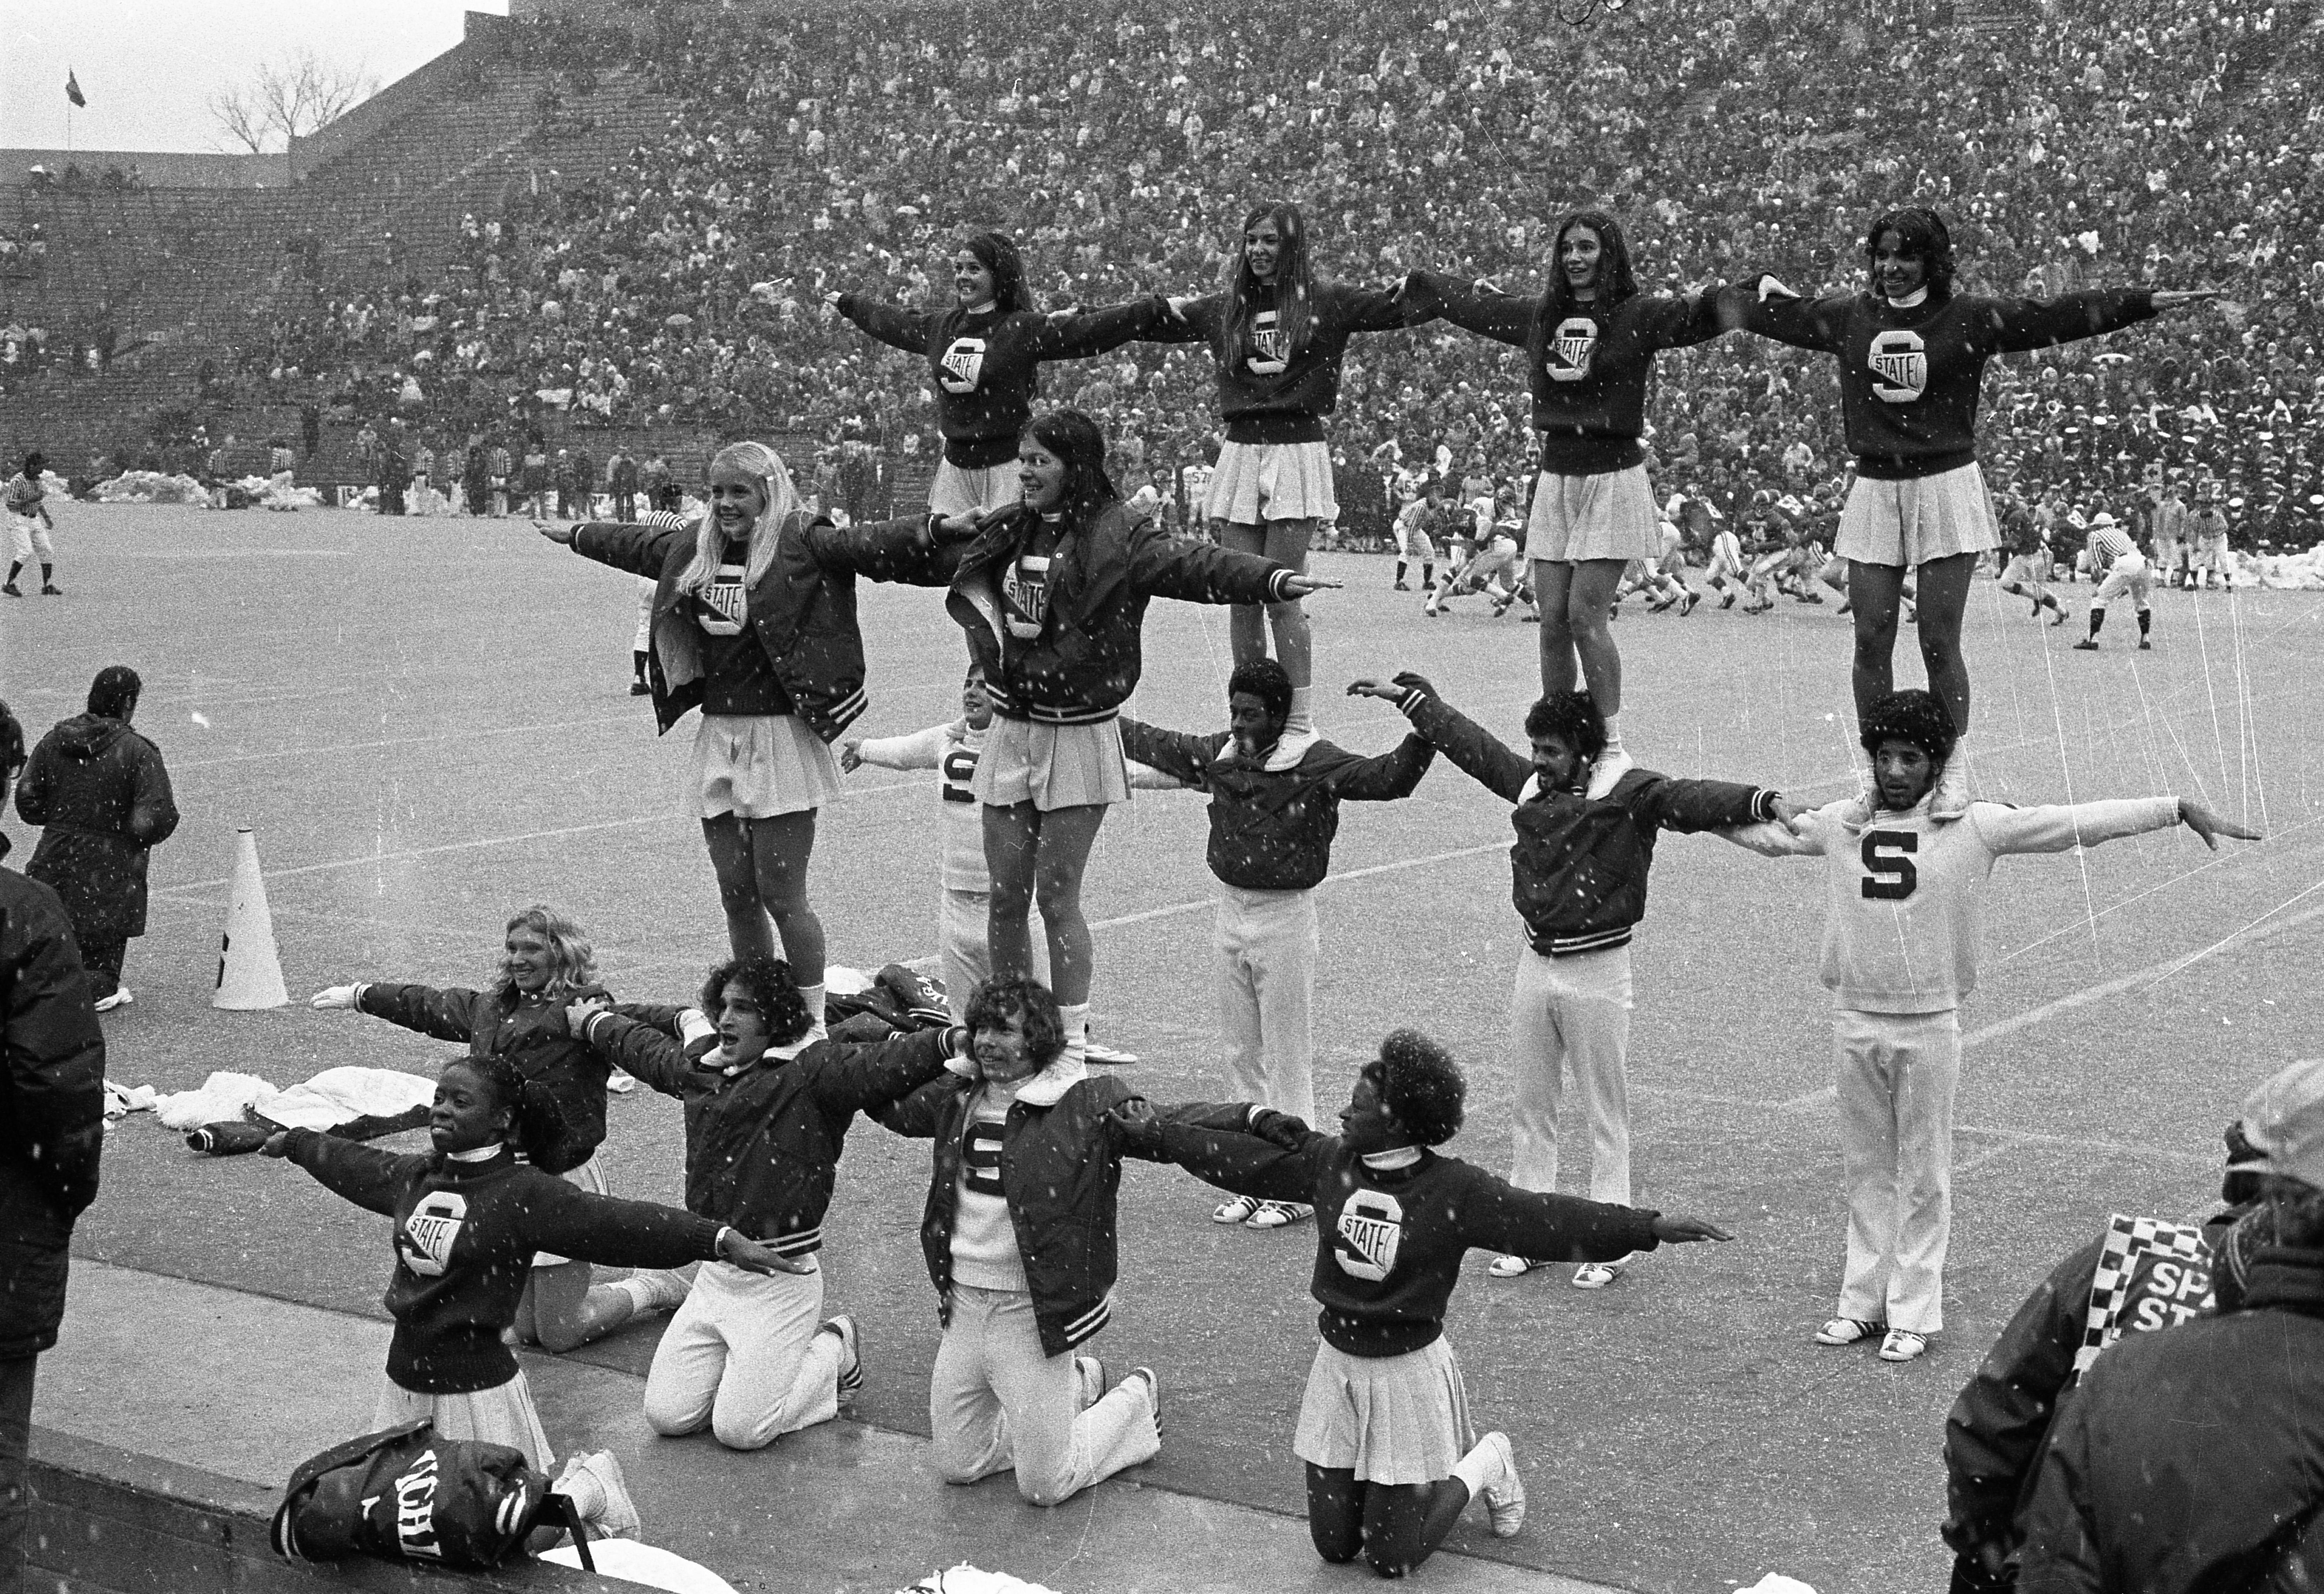 Cheerleaders at the MSU vs Northwestern football game, 1972